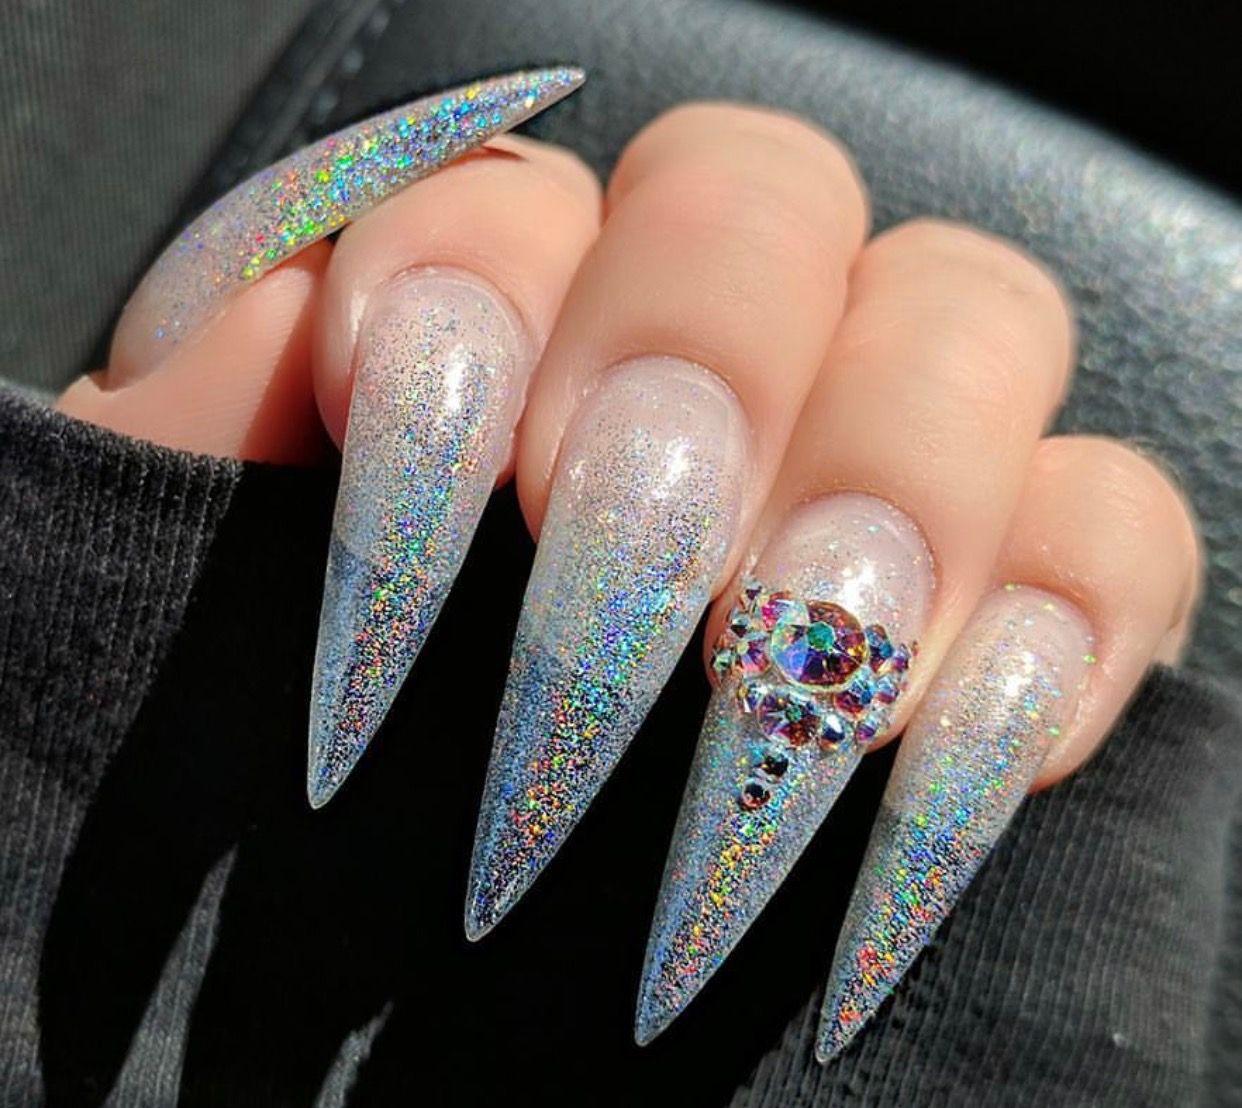 Pin de Kamilla Cardoso en Nails | Pinterest | Uñas holográficas